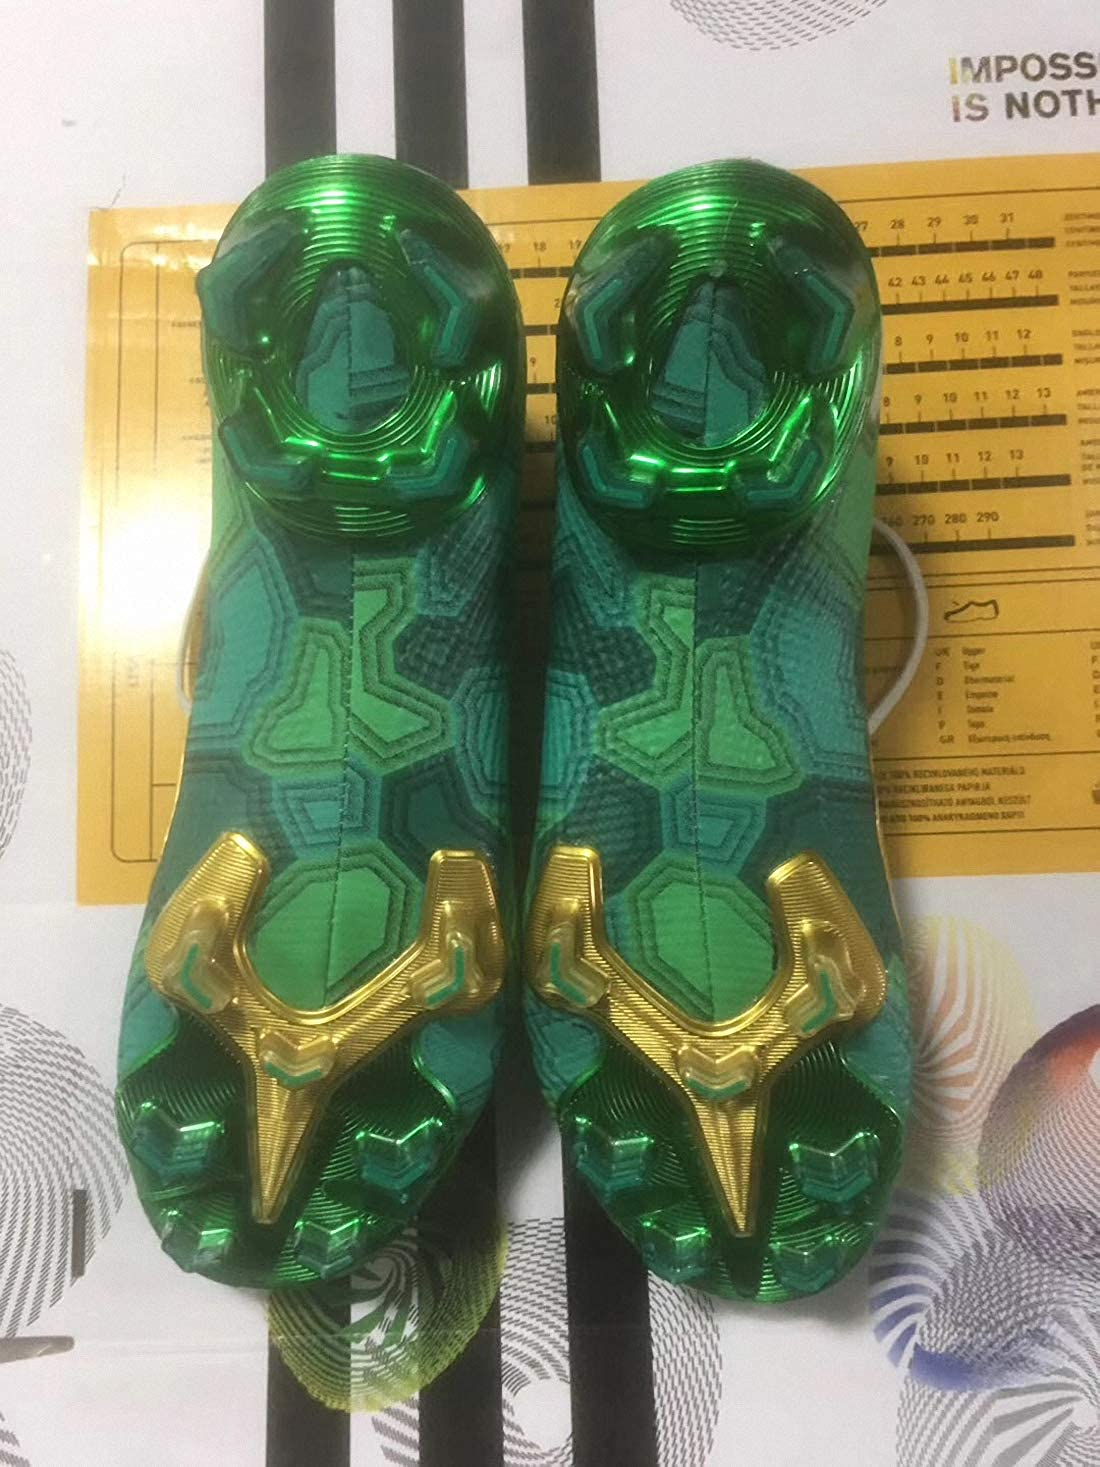 7 Chaussures de Football Homme Sport Femme VII Sneaker Basket FG/MG Mixte Adulte de Course Outdoor Shoe Green